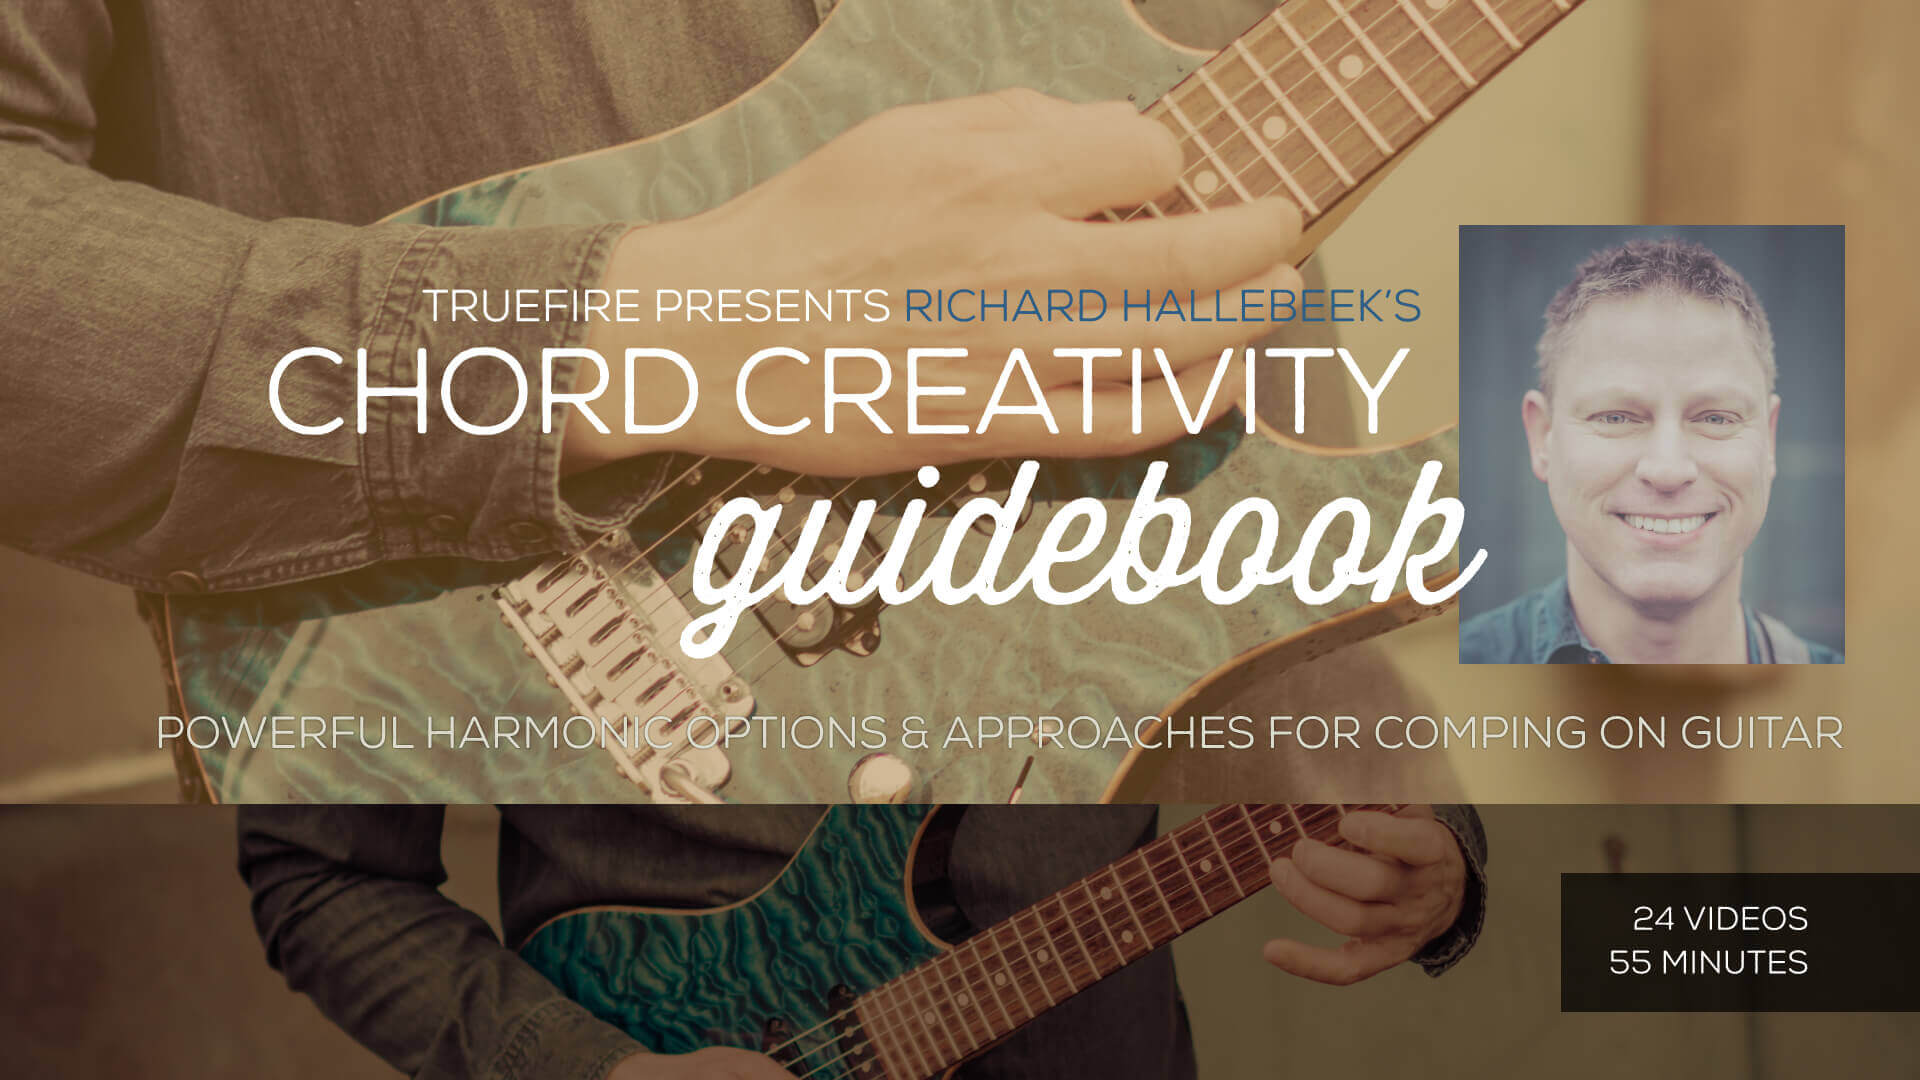 Chord Creativity Guidebook Guitar Lessons Truefire